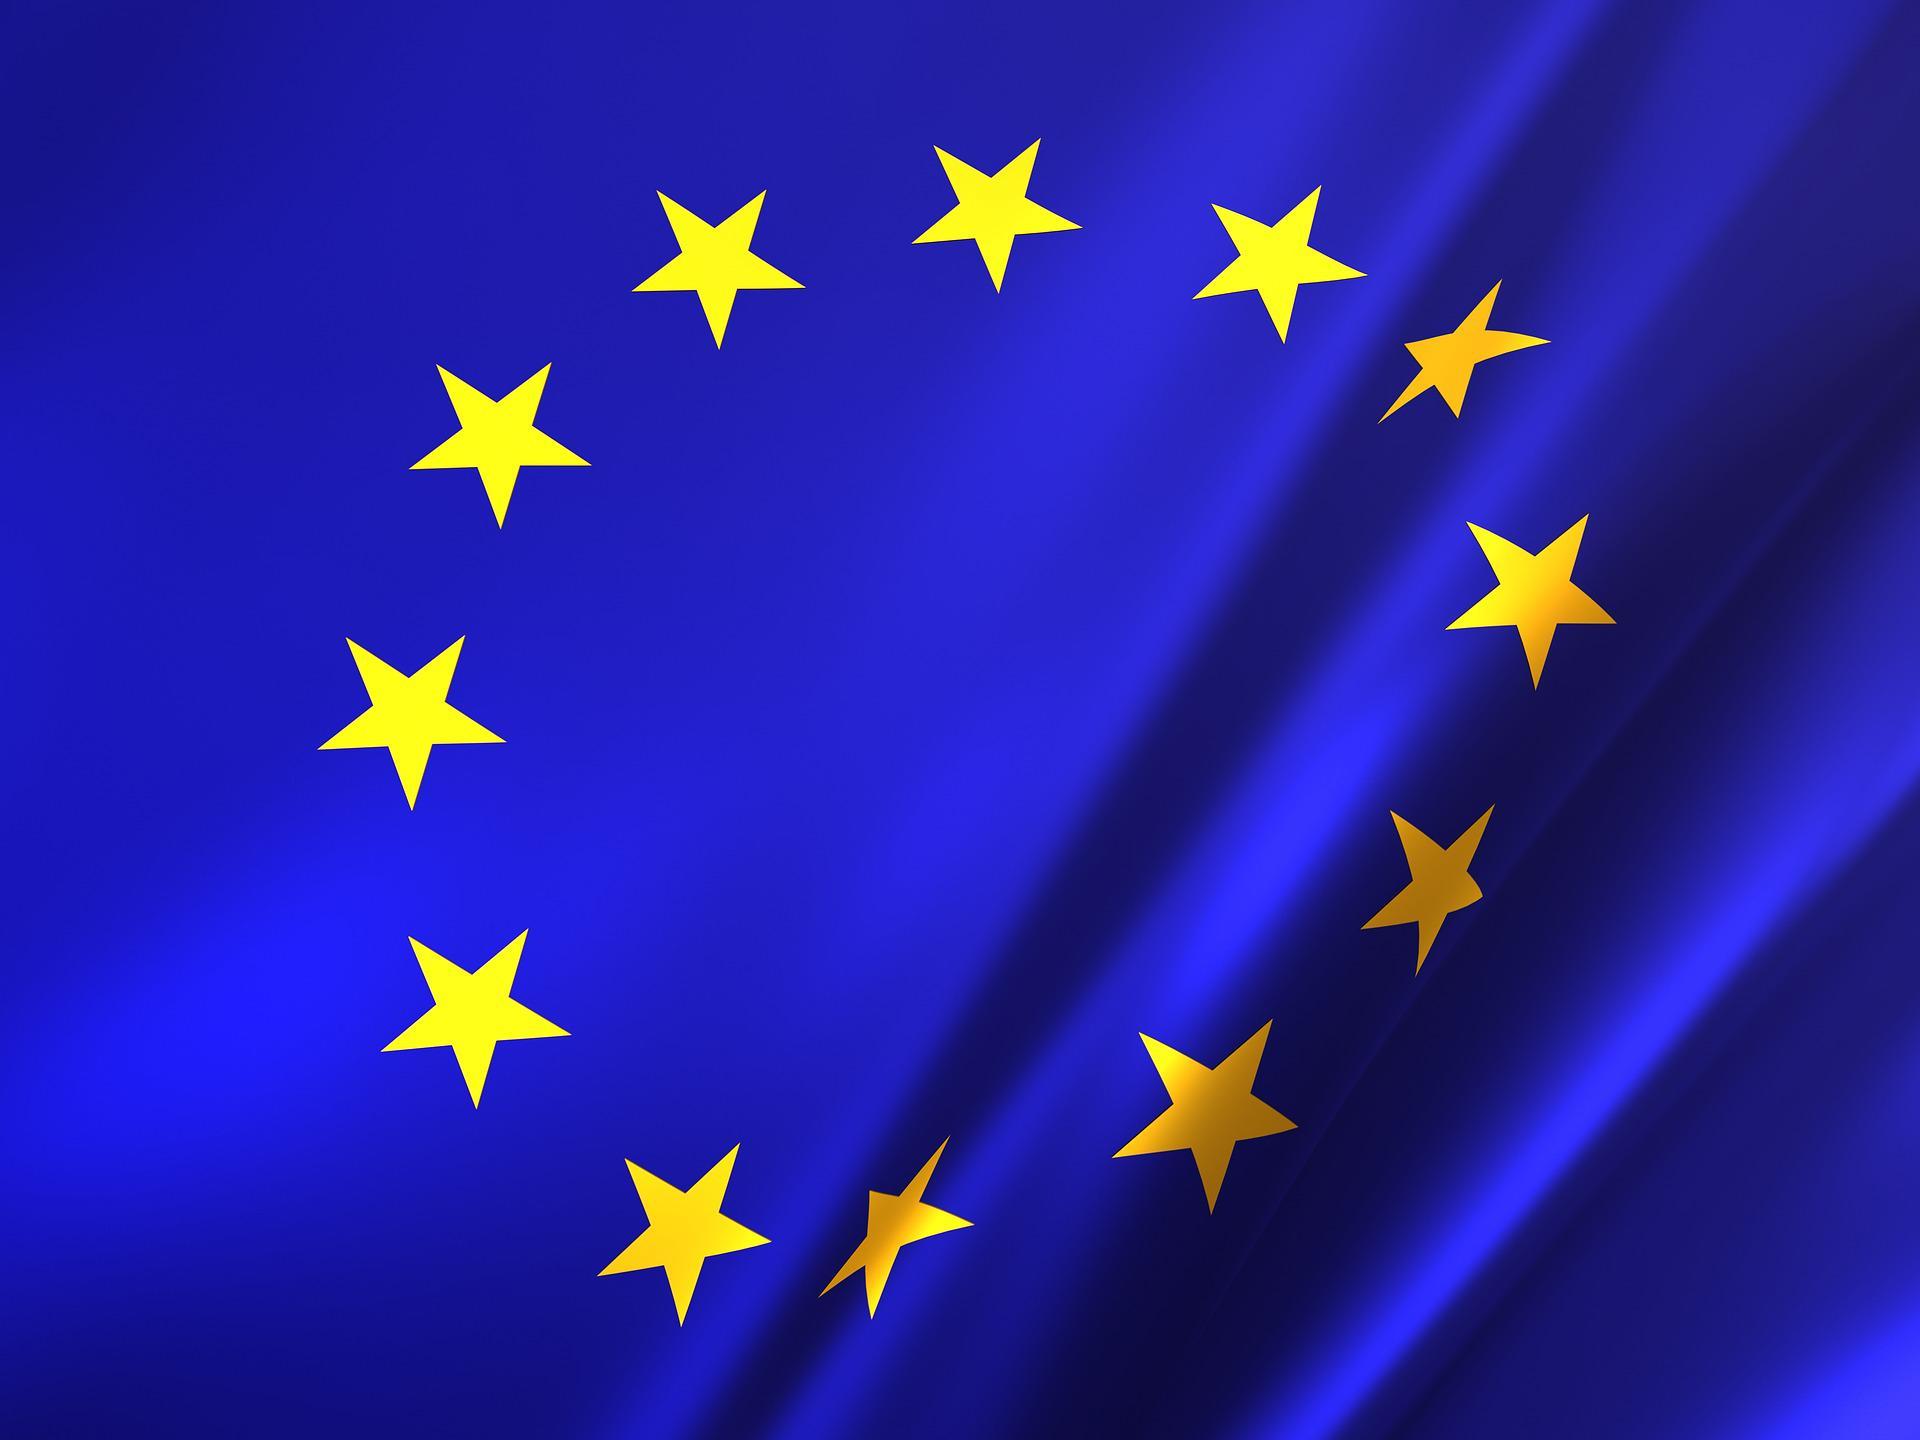 Налоги в Европе поднялись